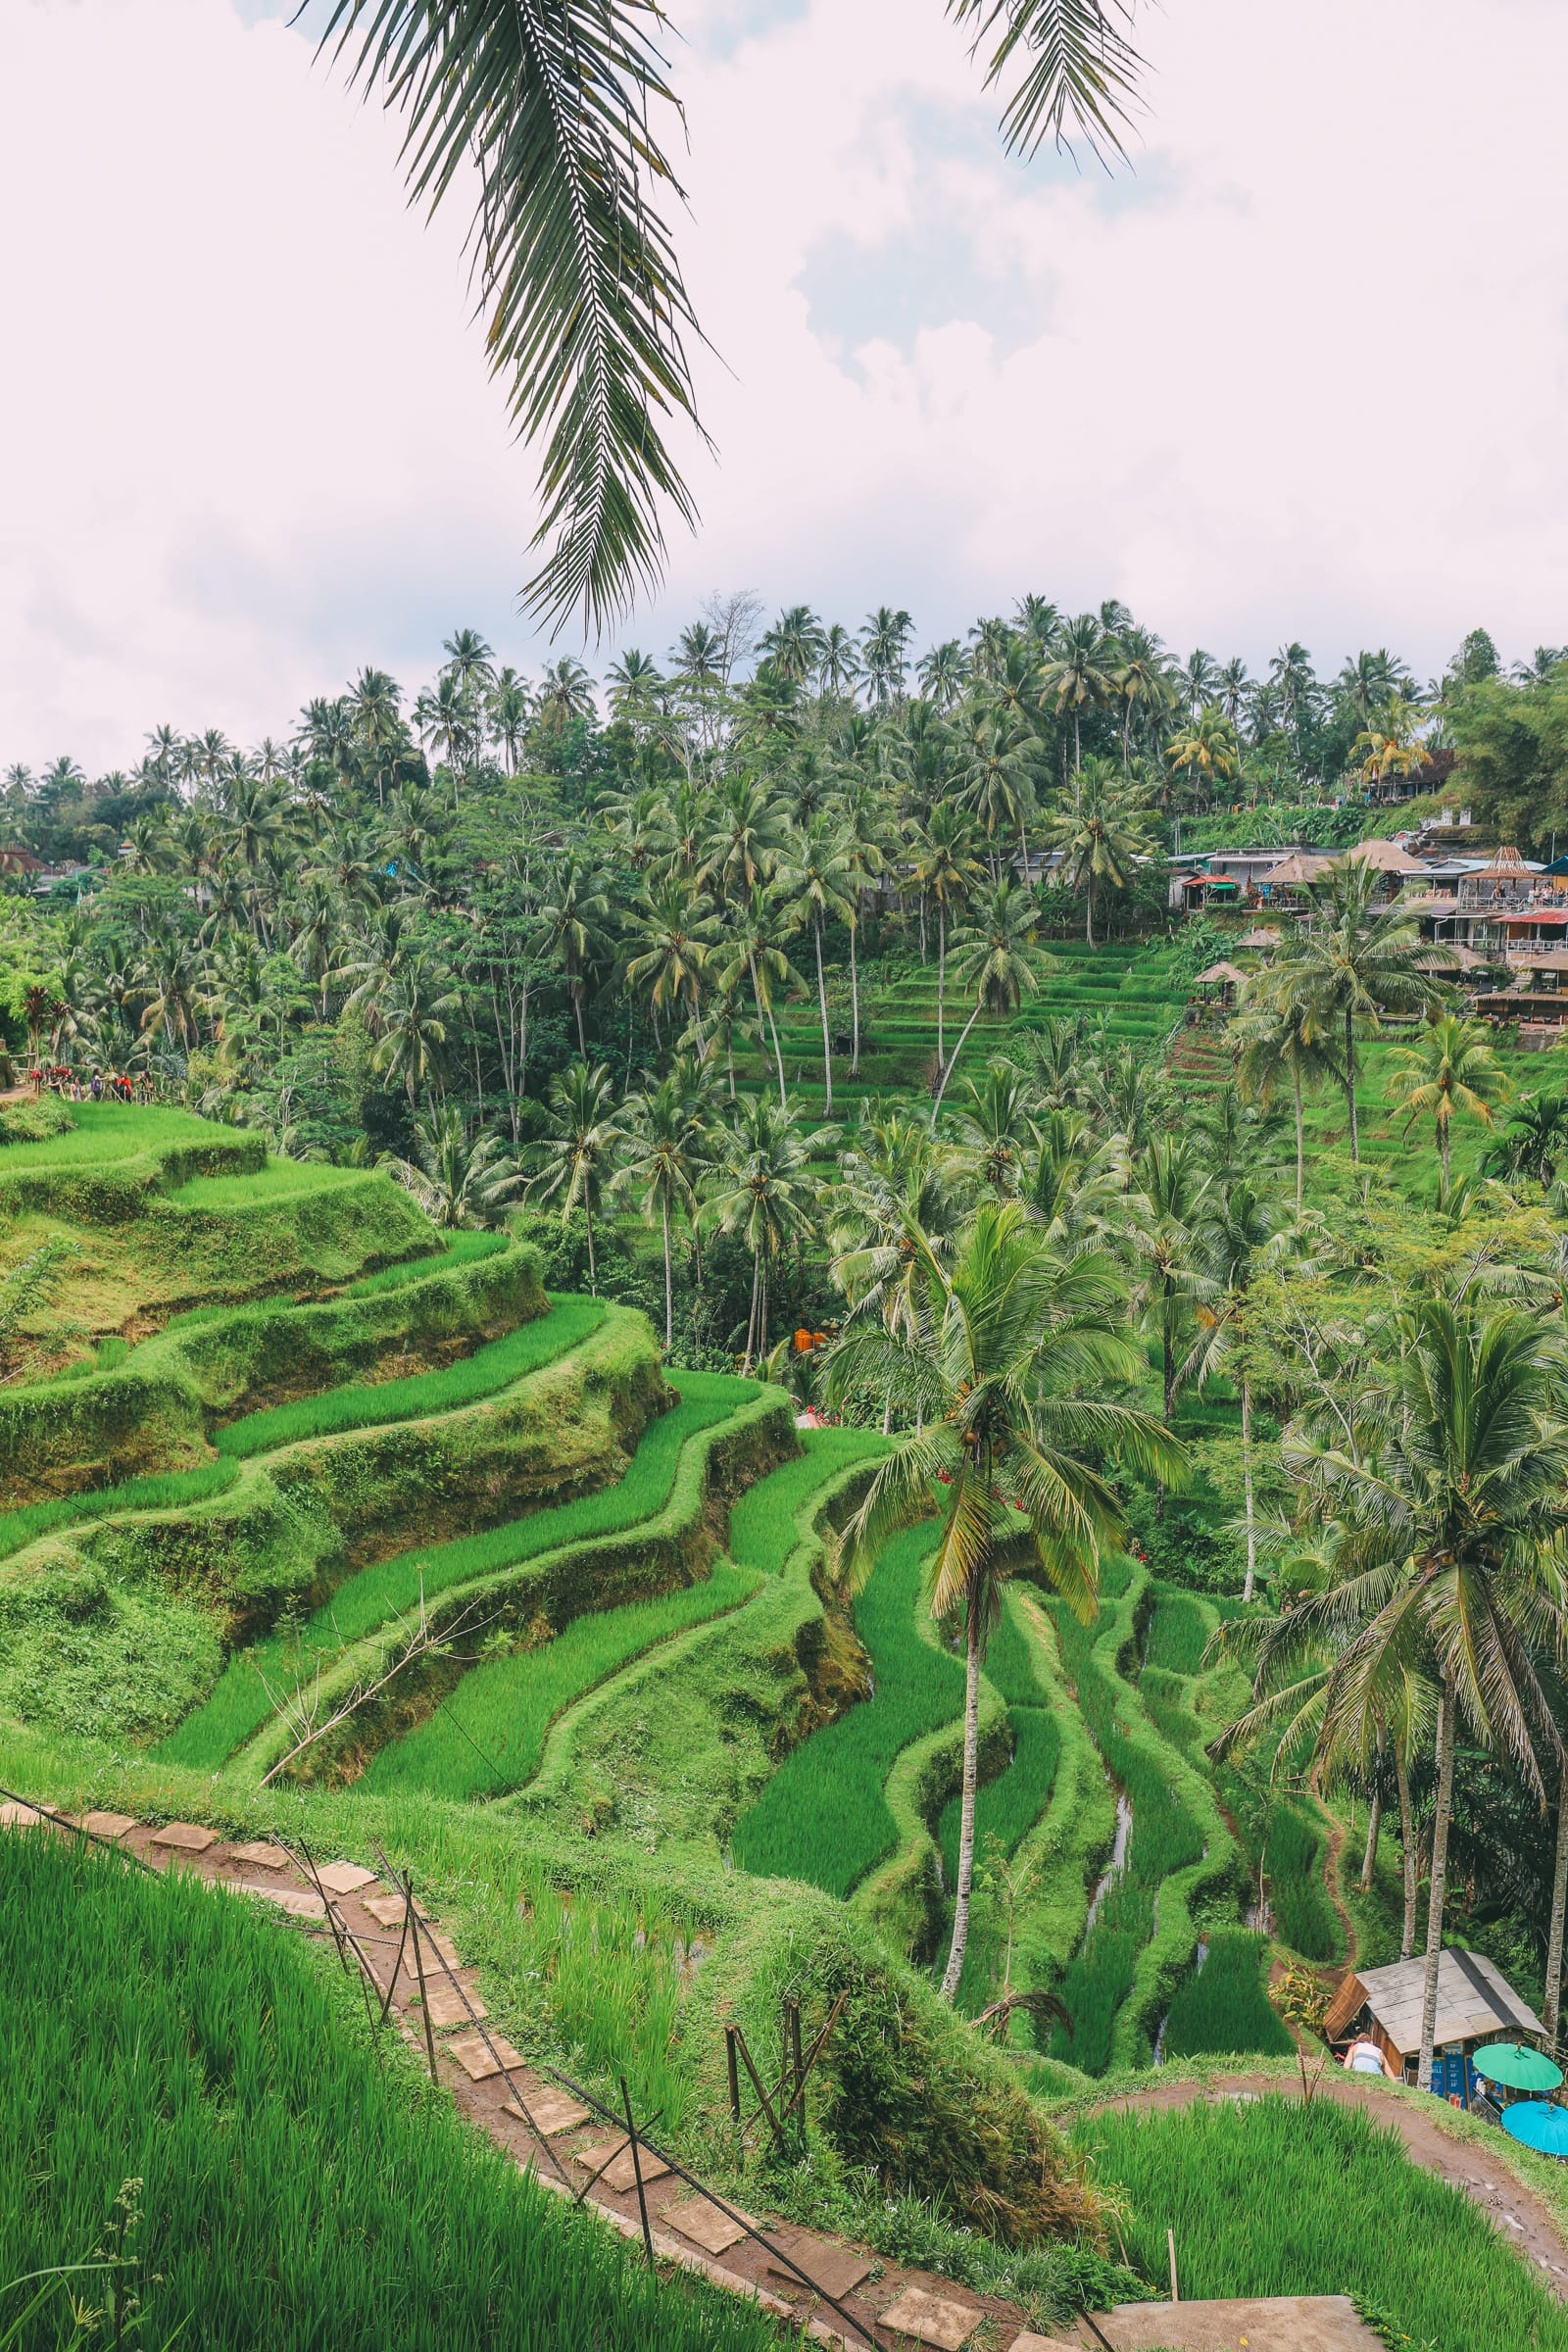 Bali Travel - Tegalalang Rice Terrace In Ubud And Gunung Kawi Temple (16)